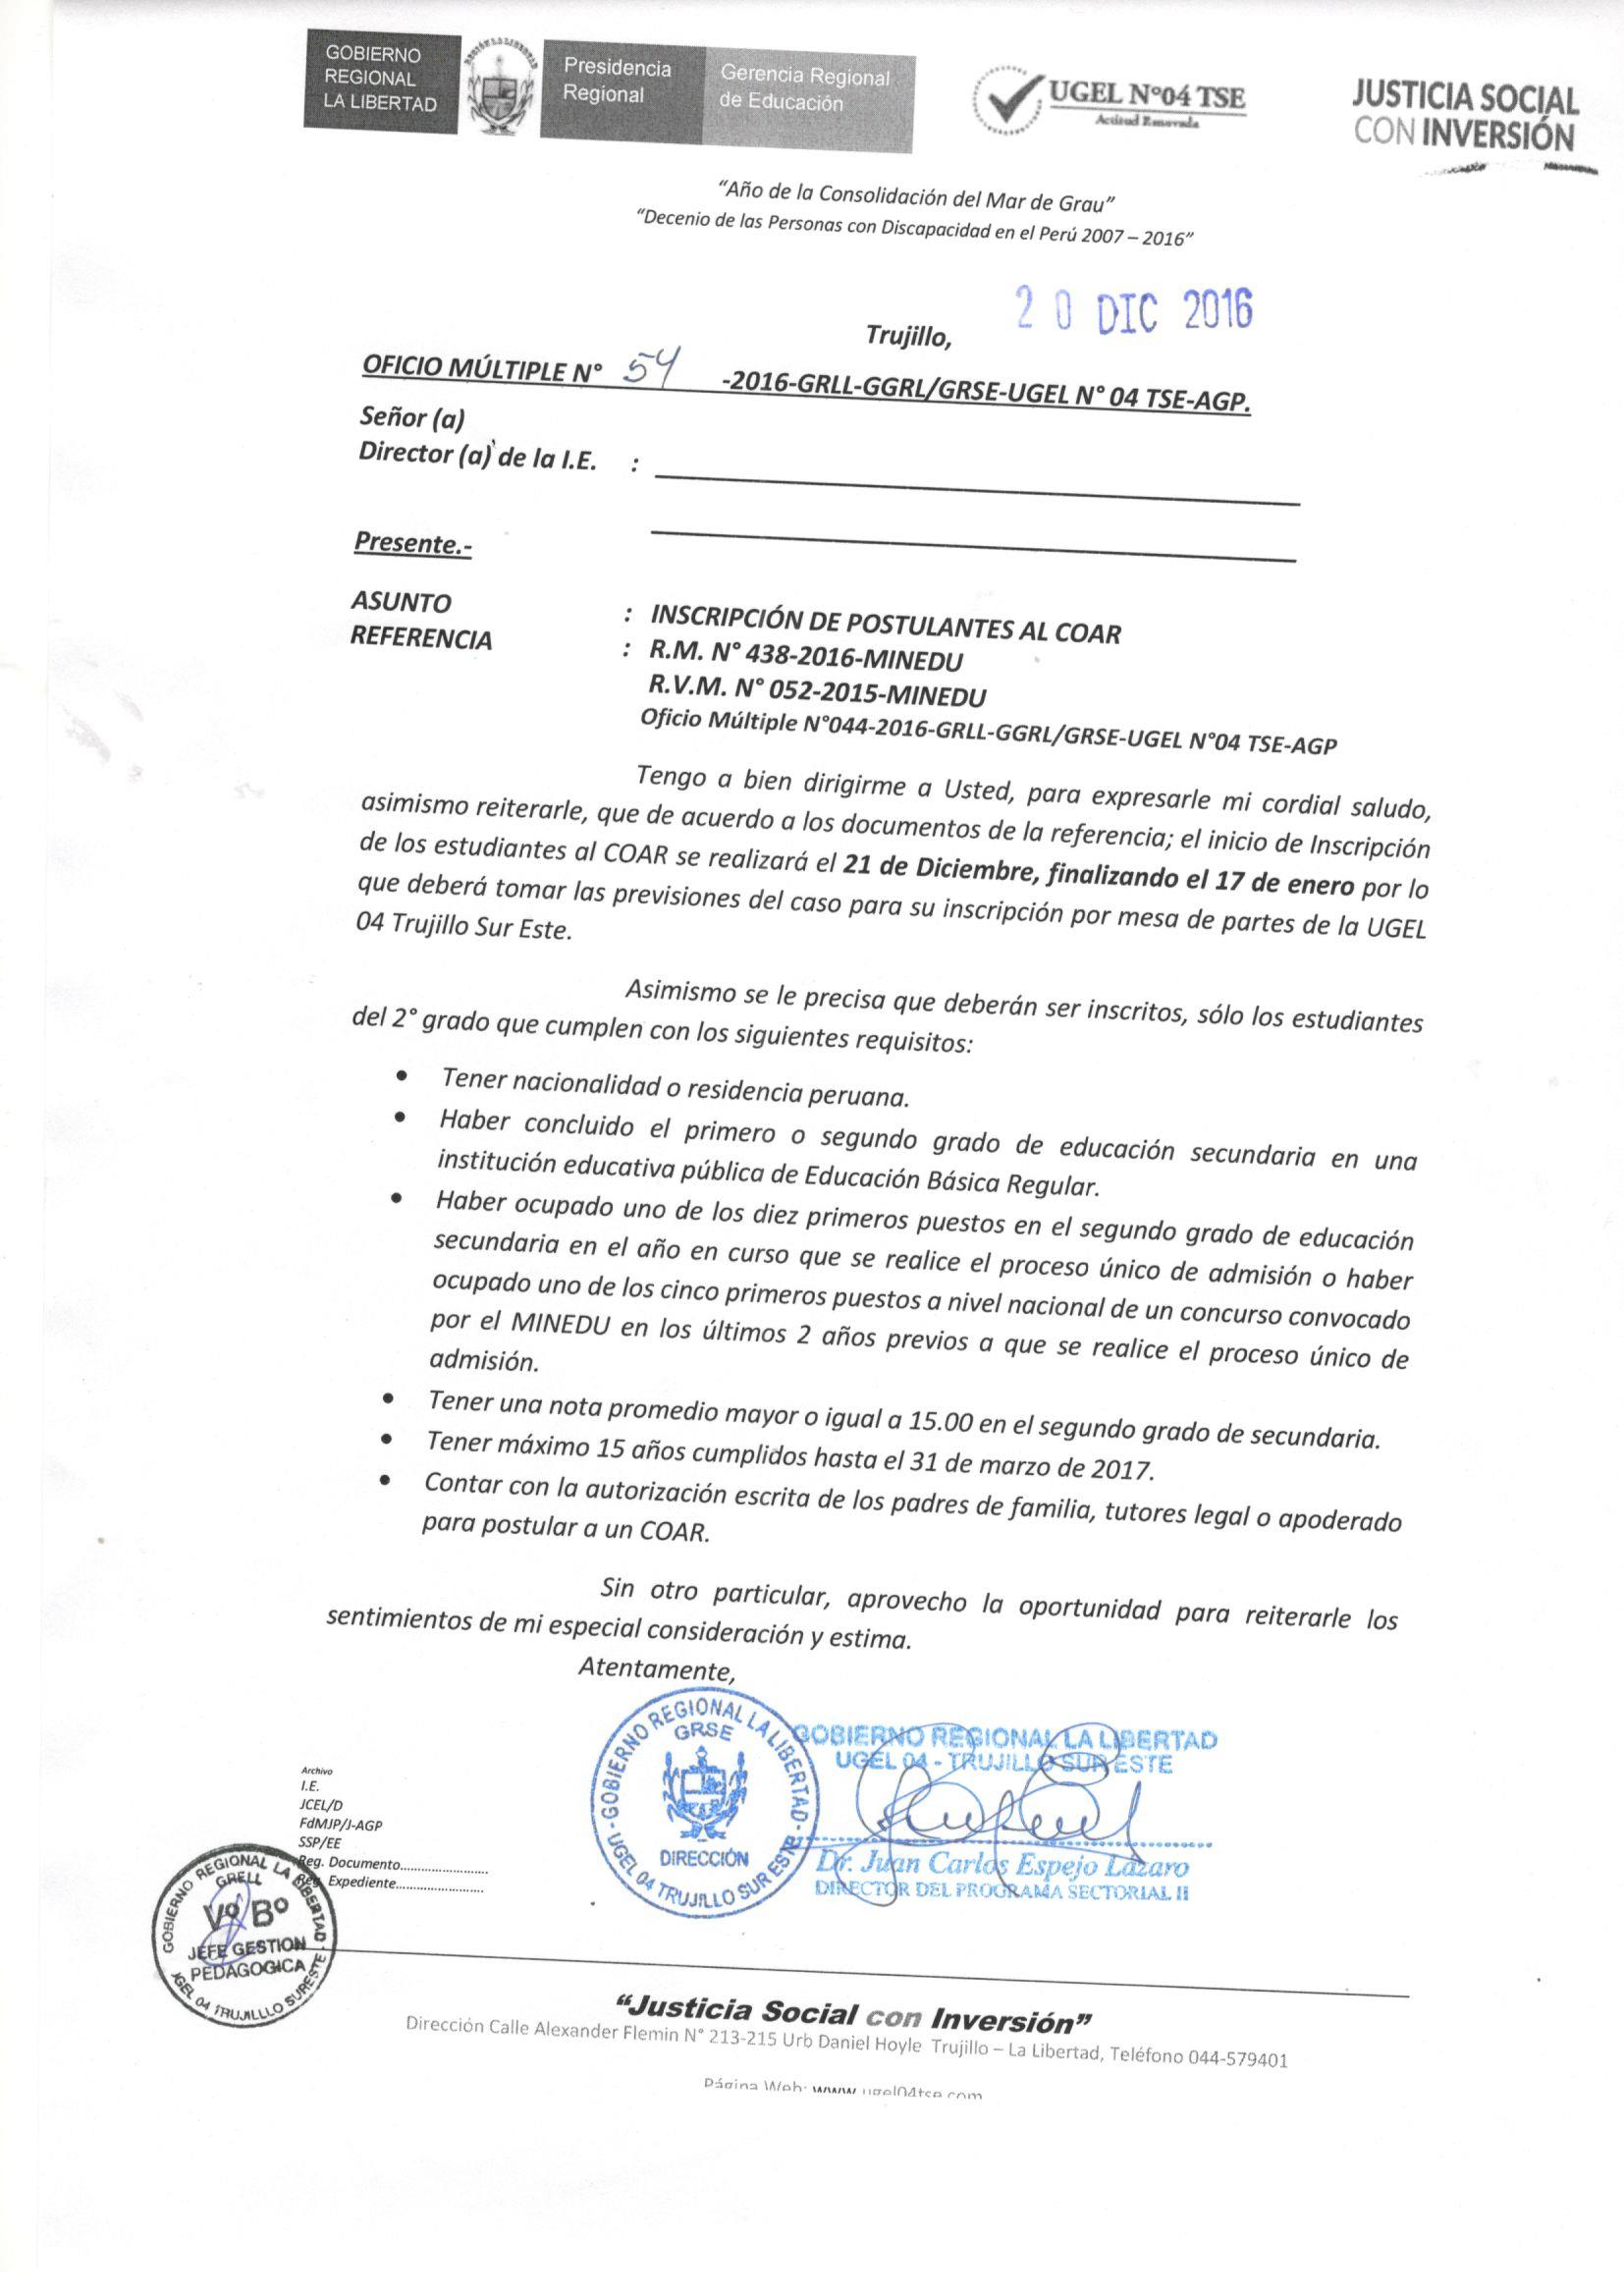 Contrato docente 2016 ugel santa contrato docente 2016 Convocatoria para las plazas docentes 2016